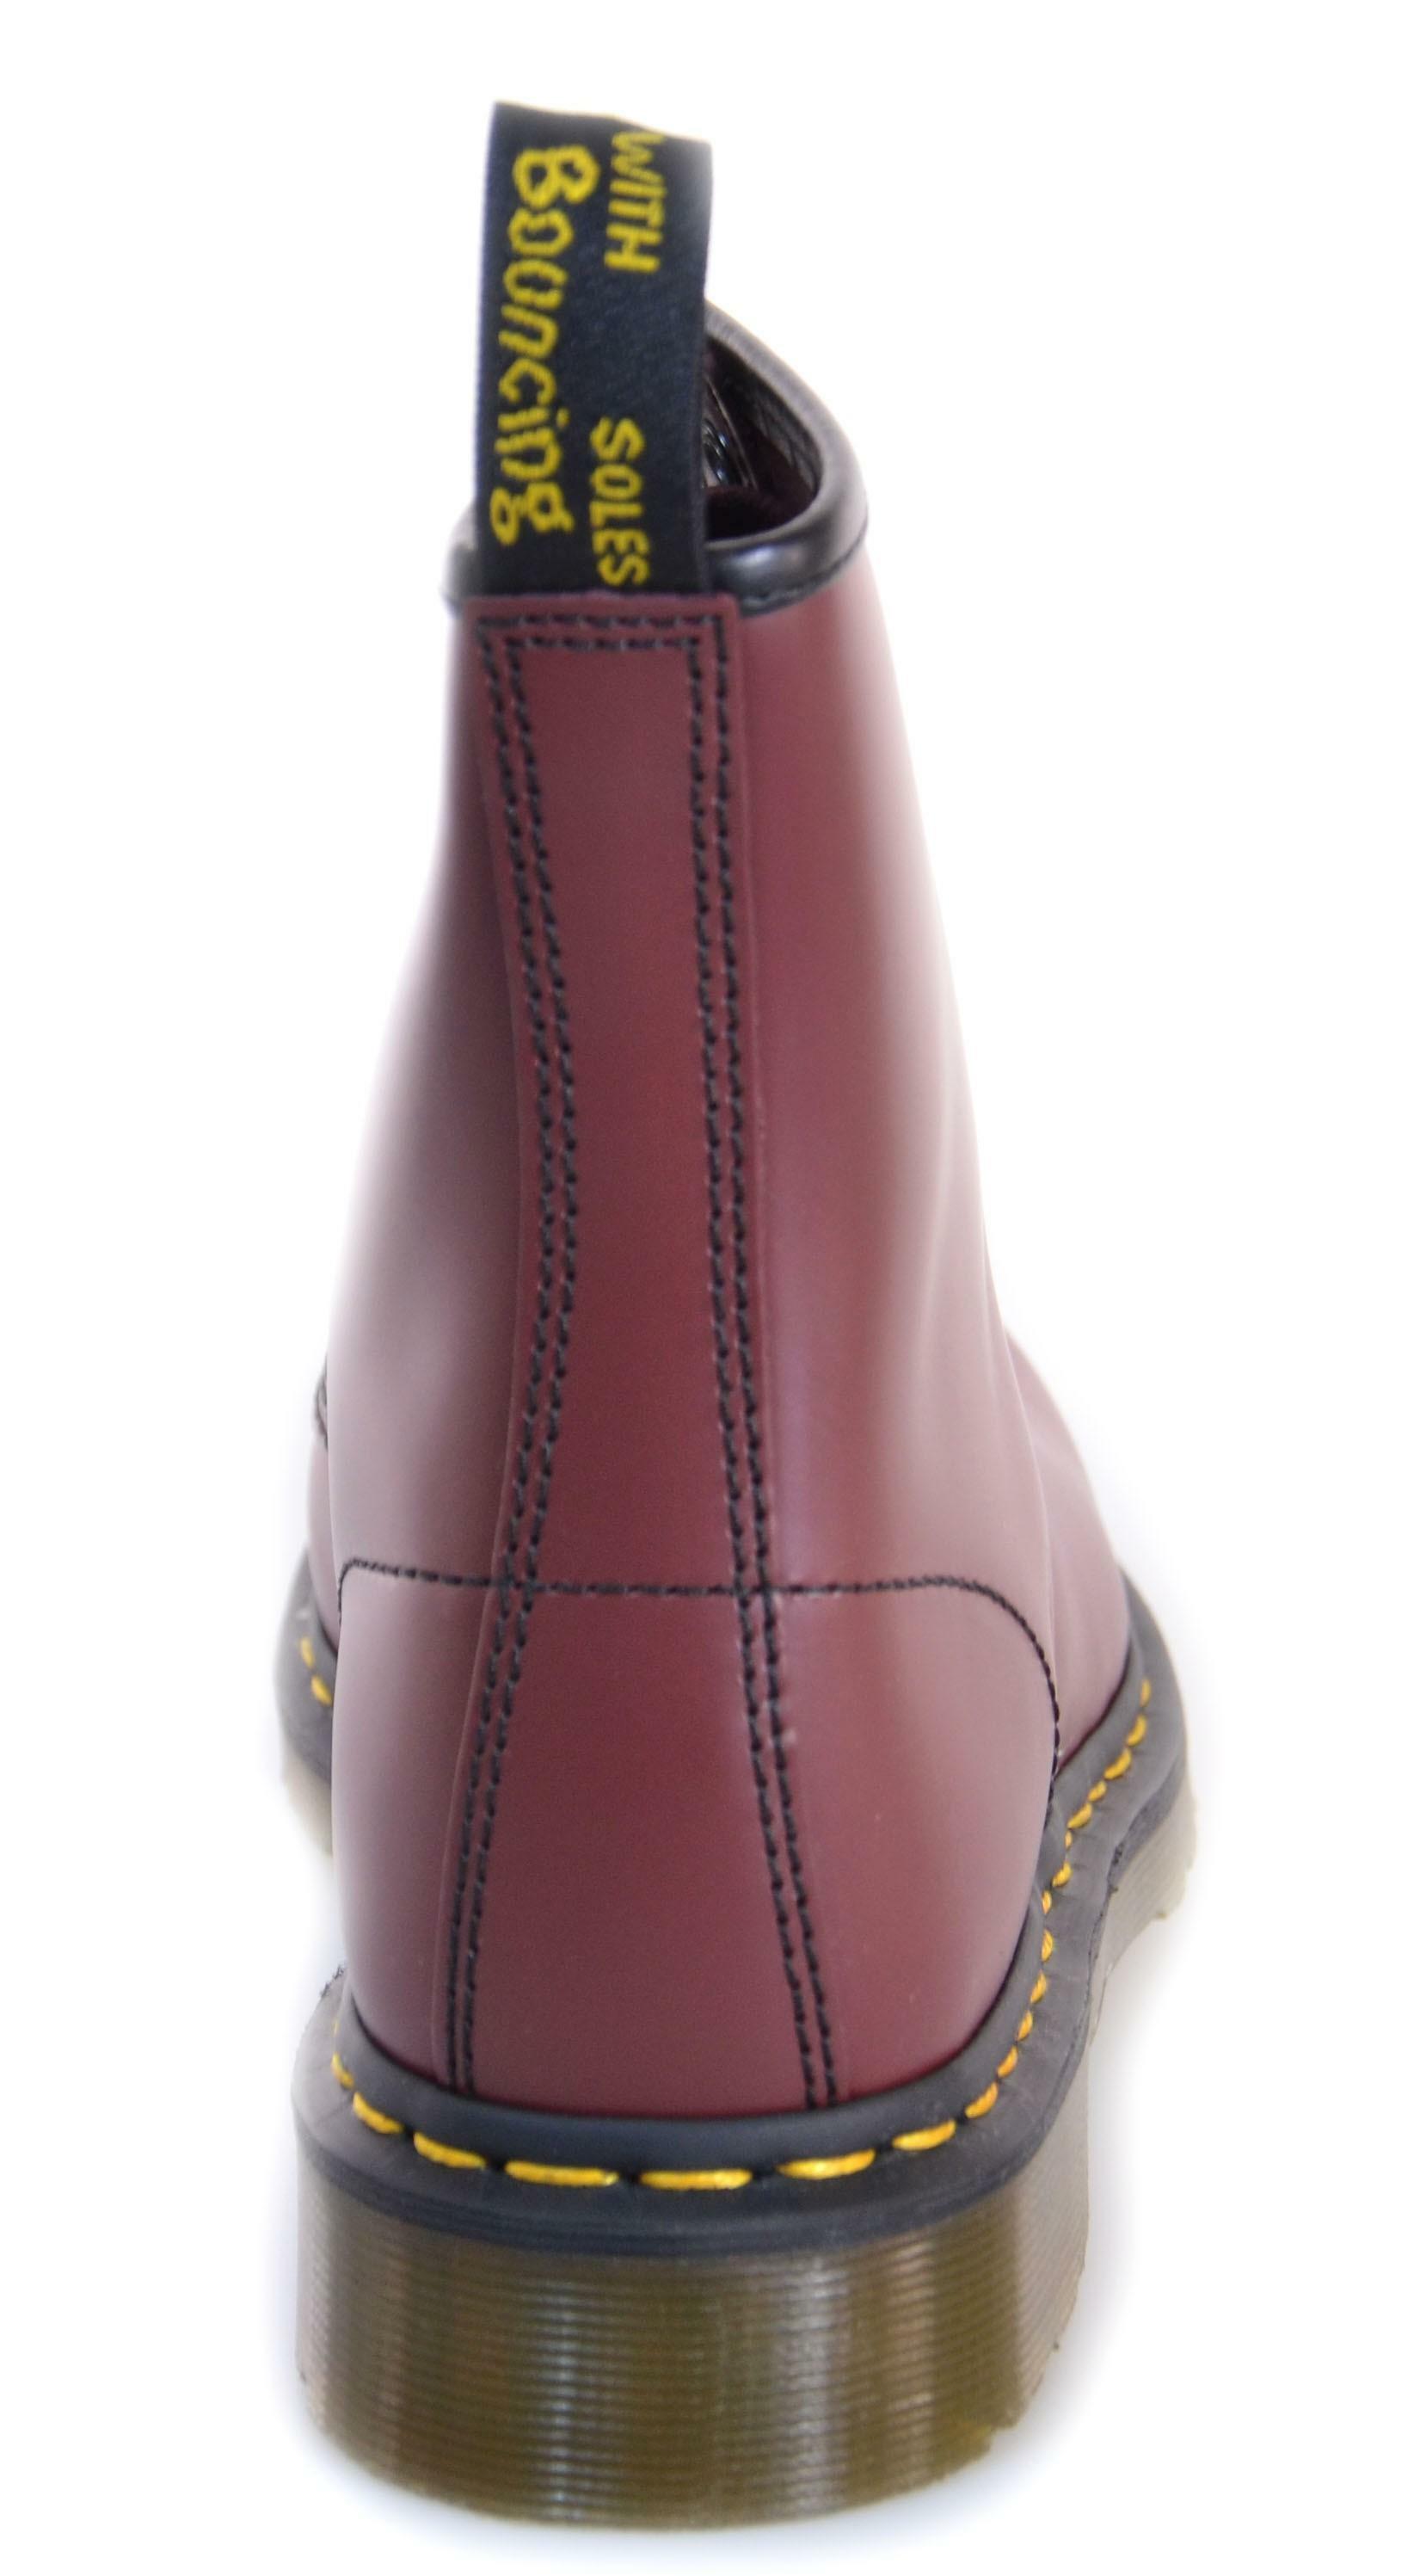 dr. martens dr. martens 1460 scarponcini rosso pelle 10072600